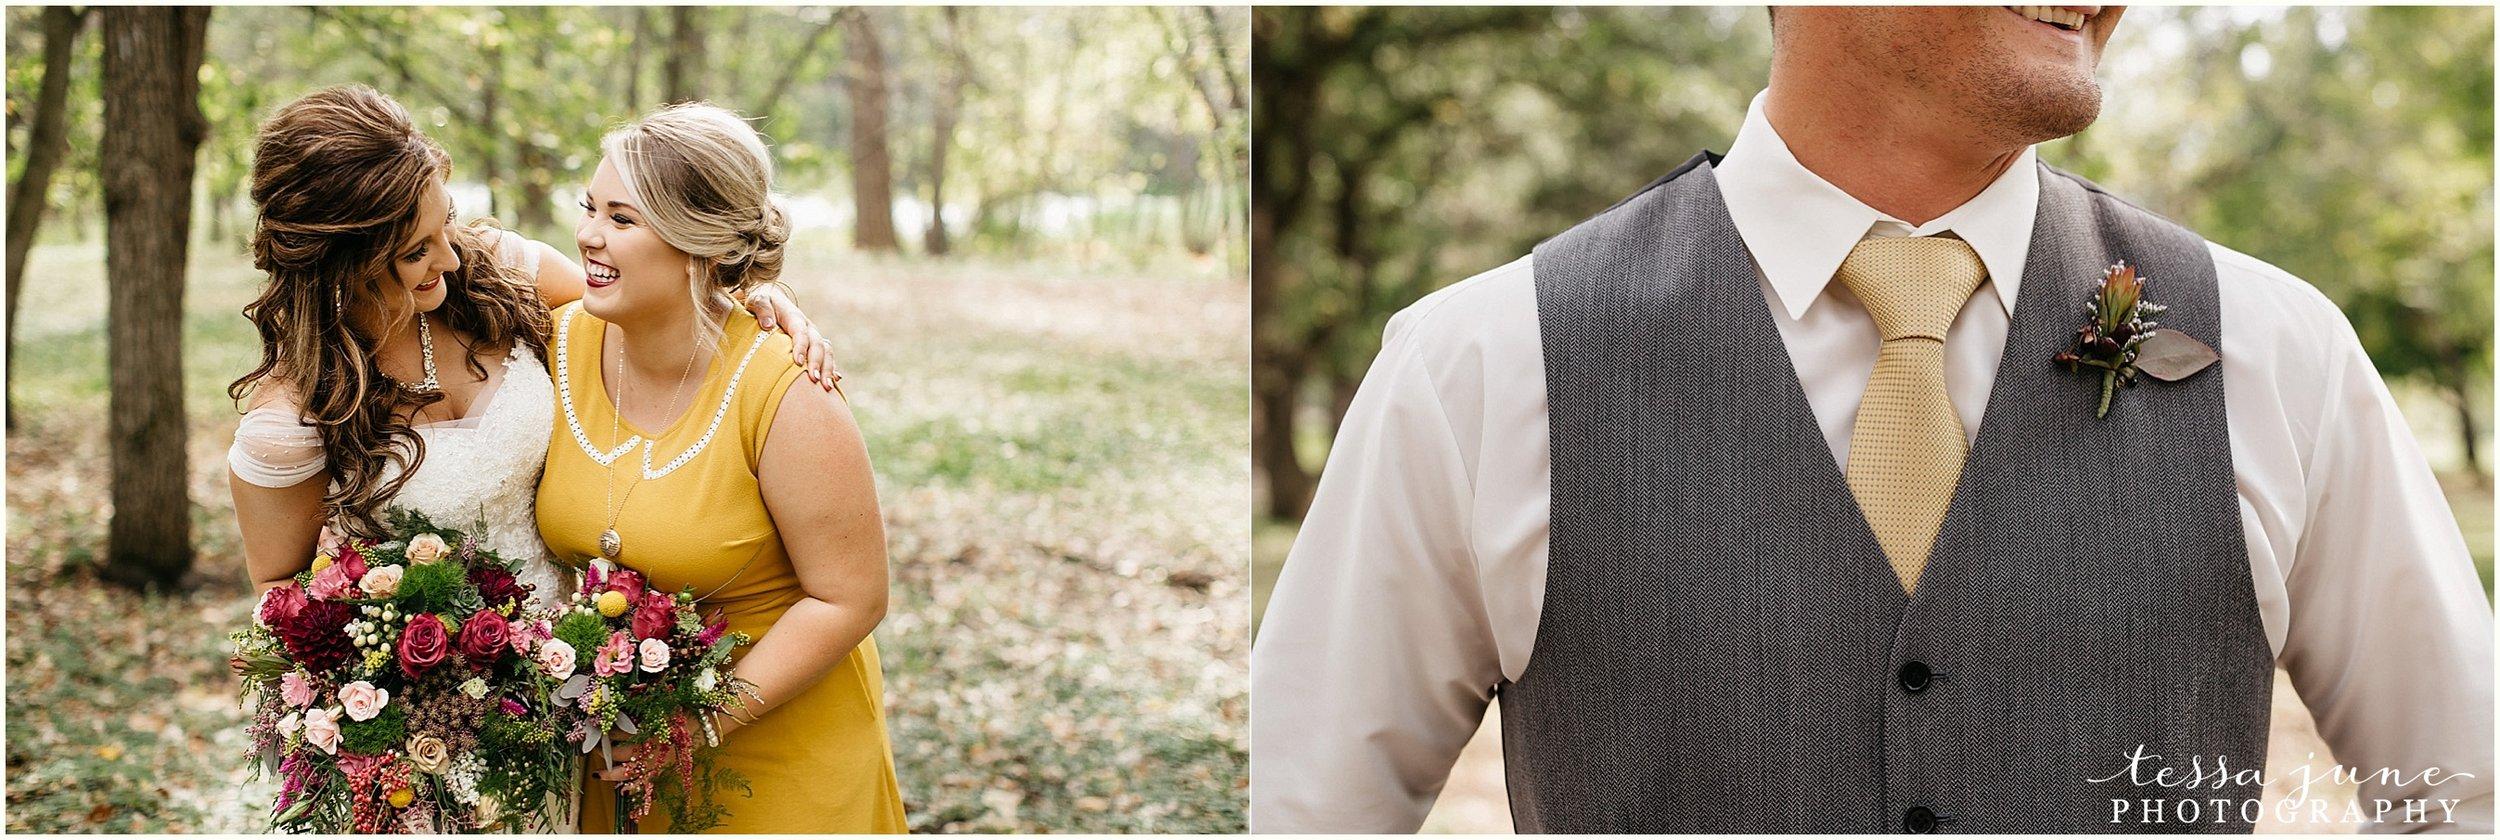 bohemian-minnesota-wedding-mismatched-bridesmaid-dresses-waterfall-st-cloud-tessa-june-photography-78.jpg